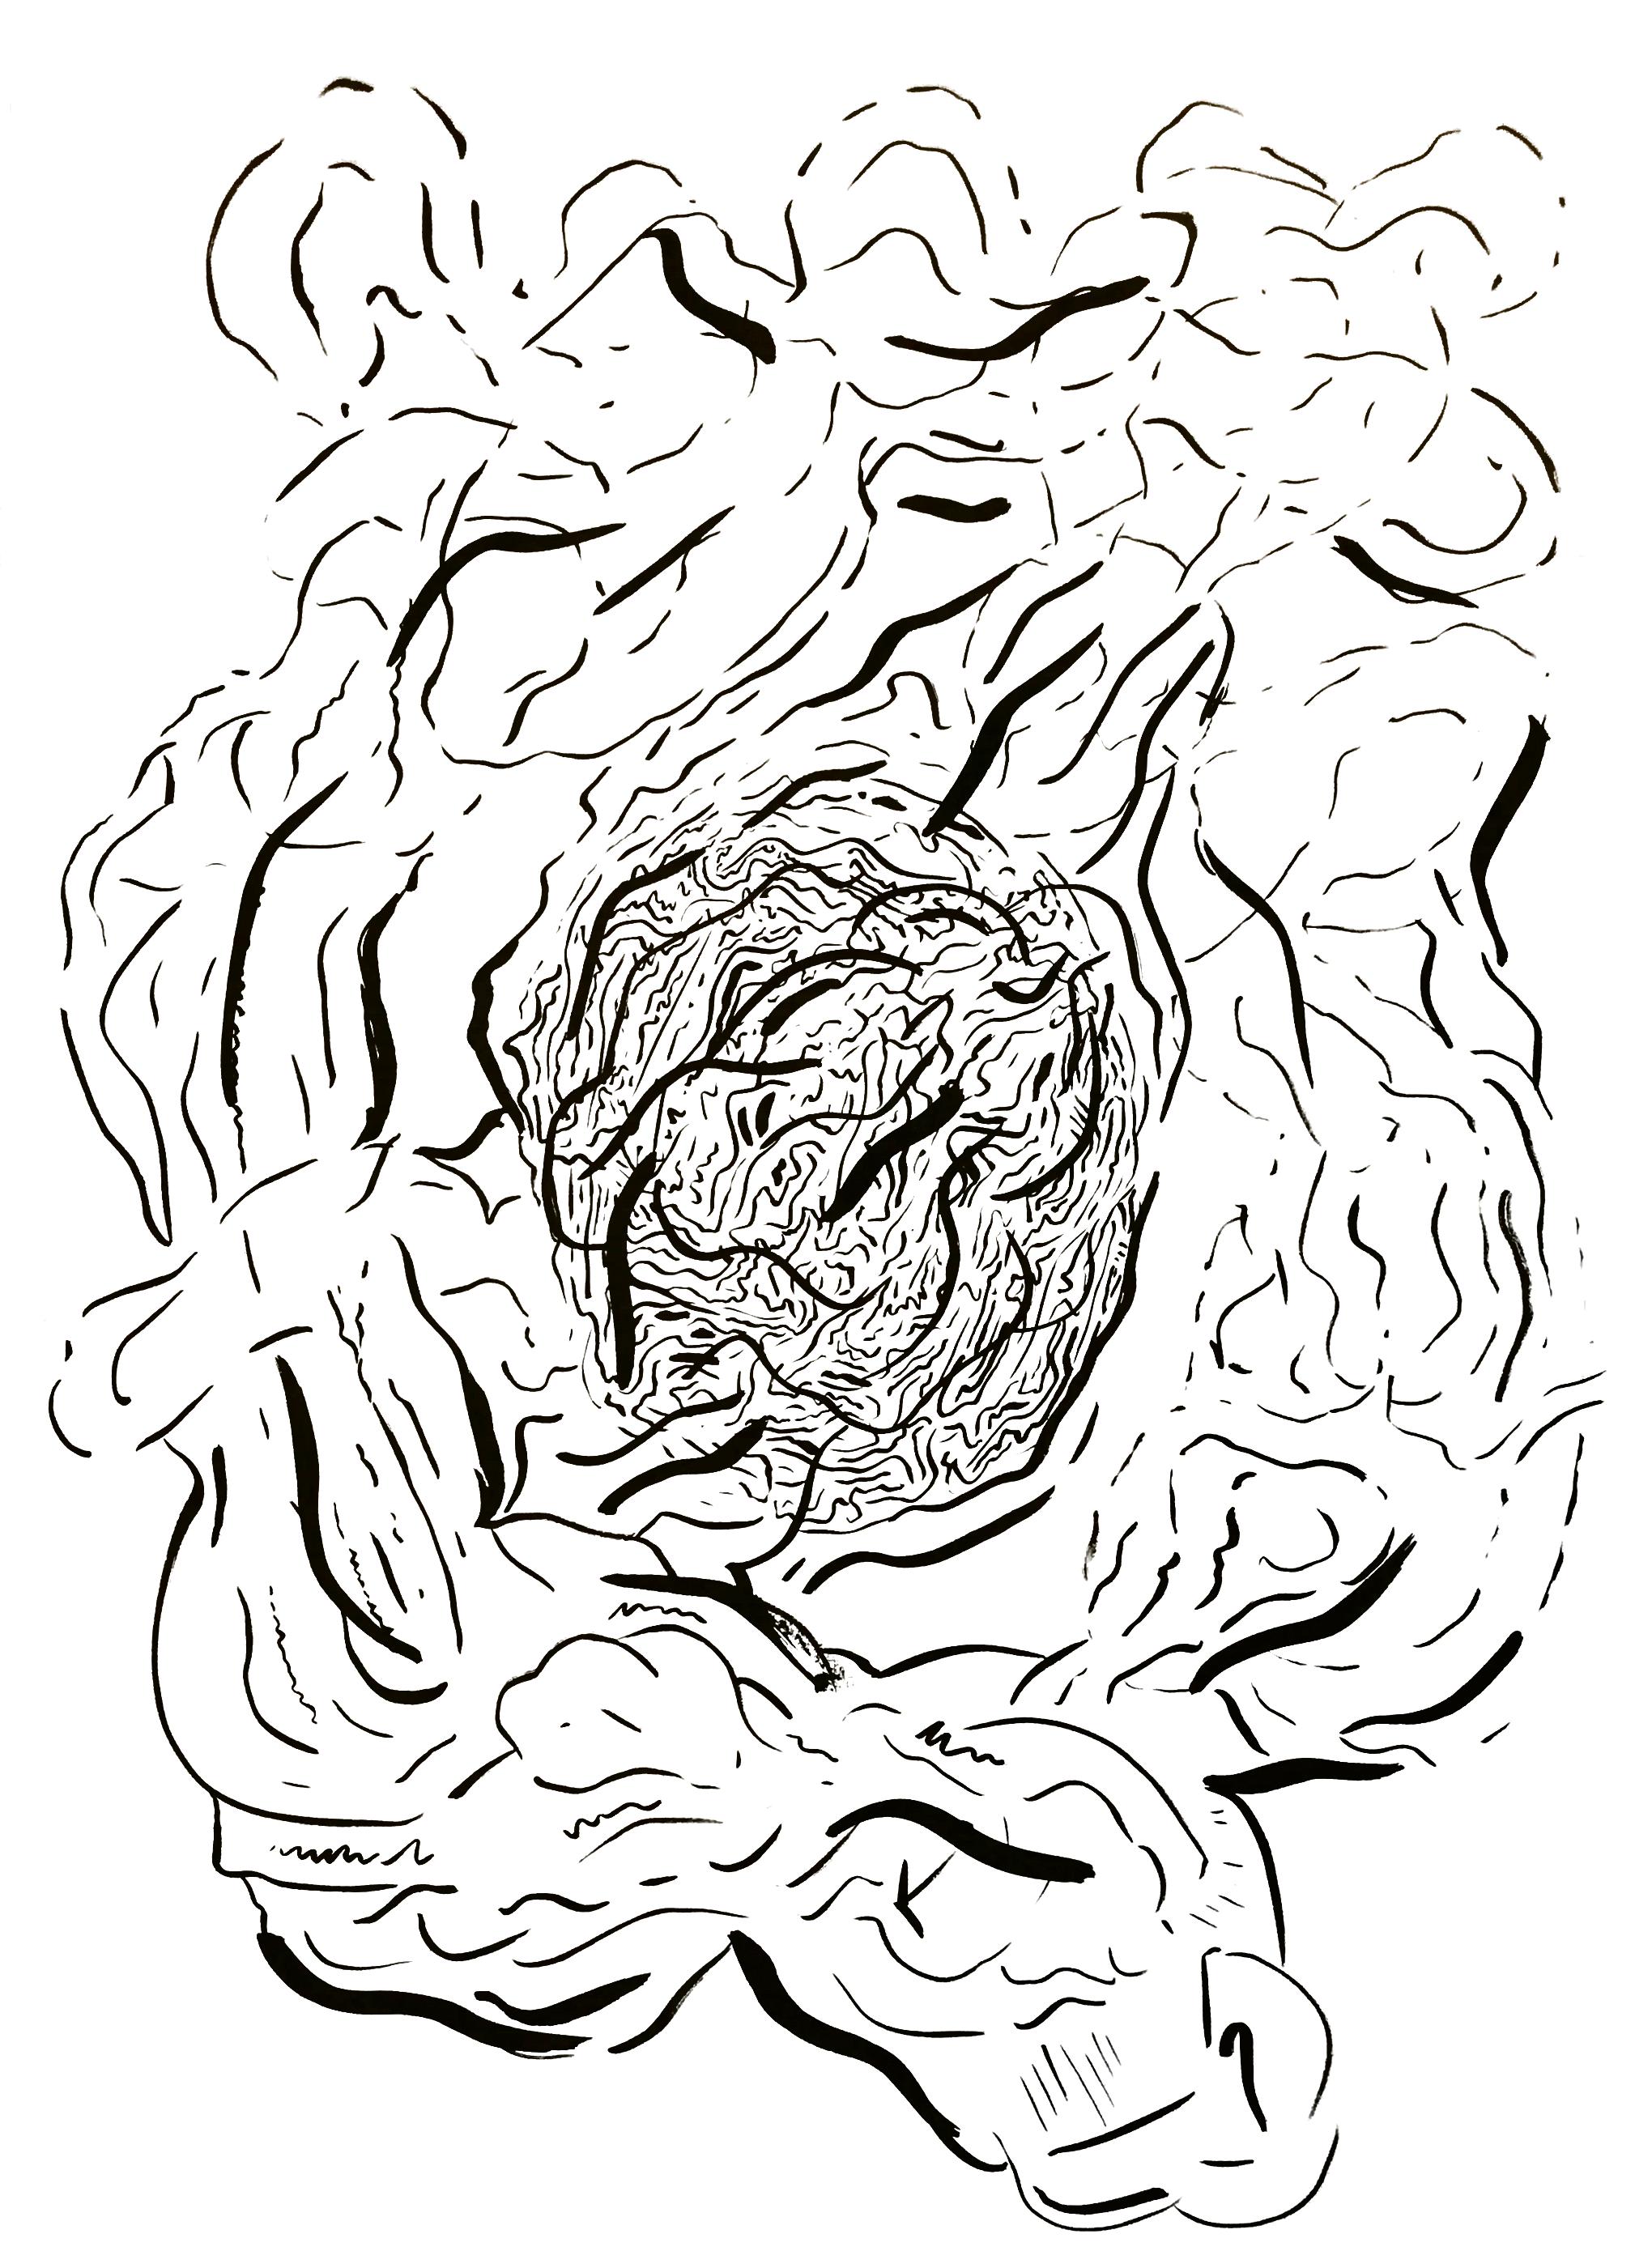 Vortex of Dryness